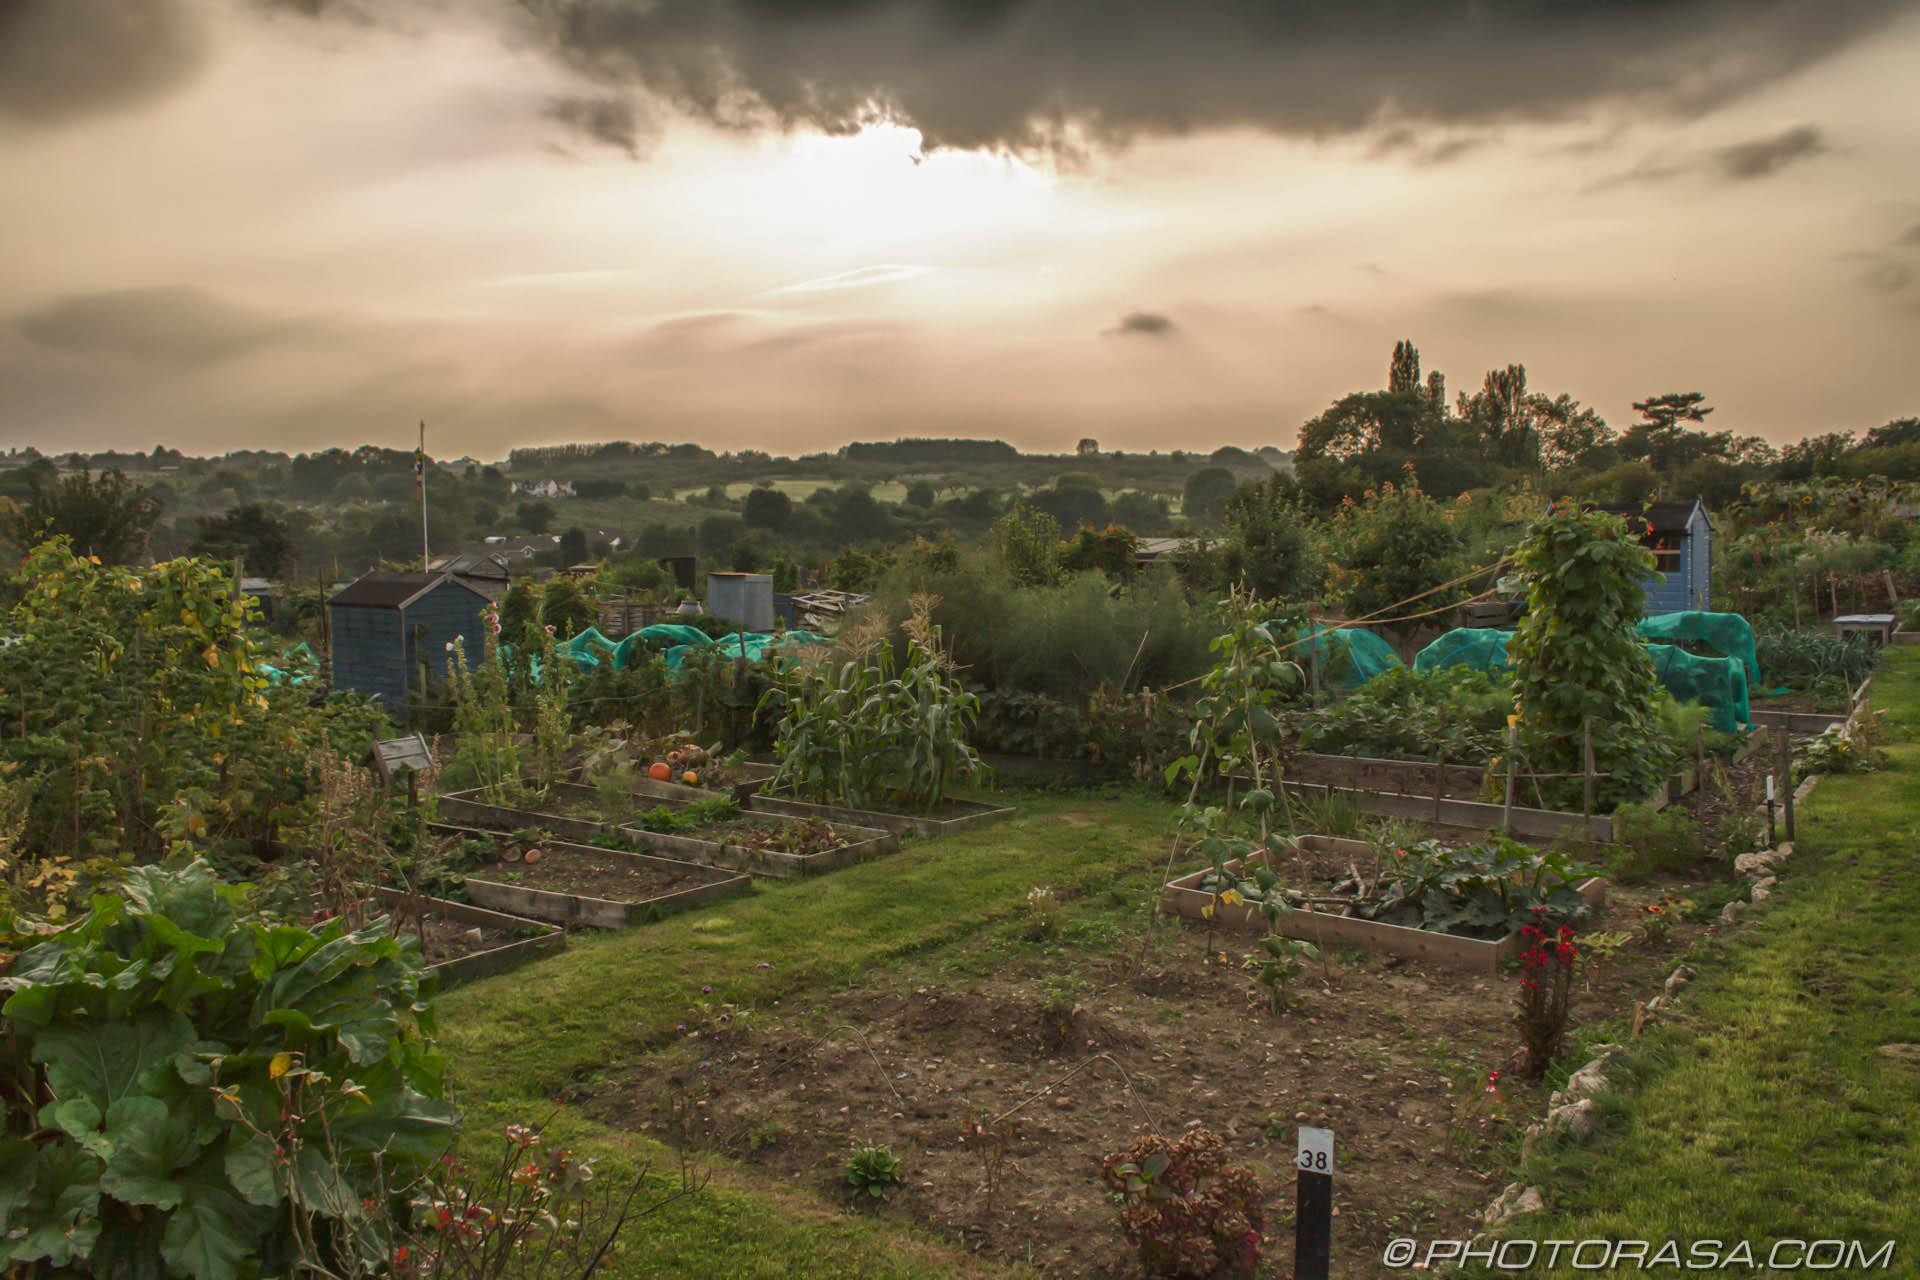 https://photorasa.com/loose-village/sunshine-behind-dark-clouds-over-allotment-plots/